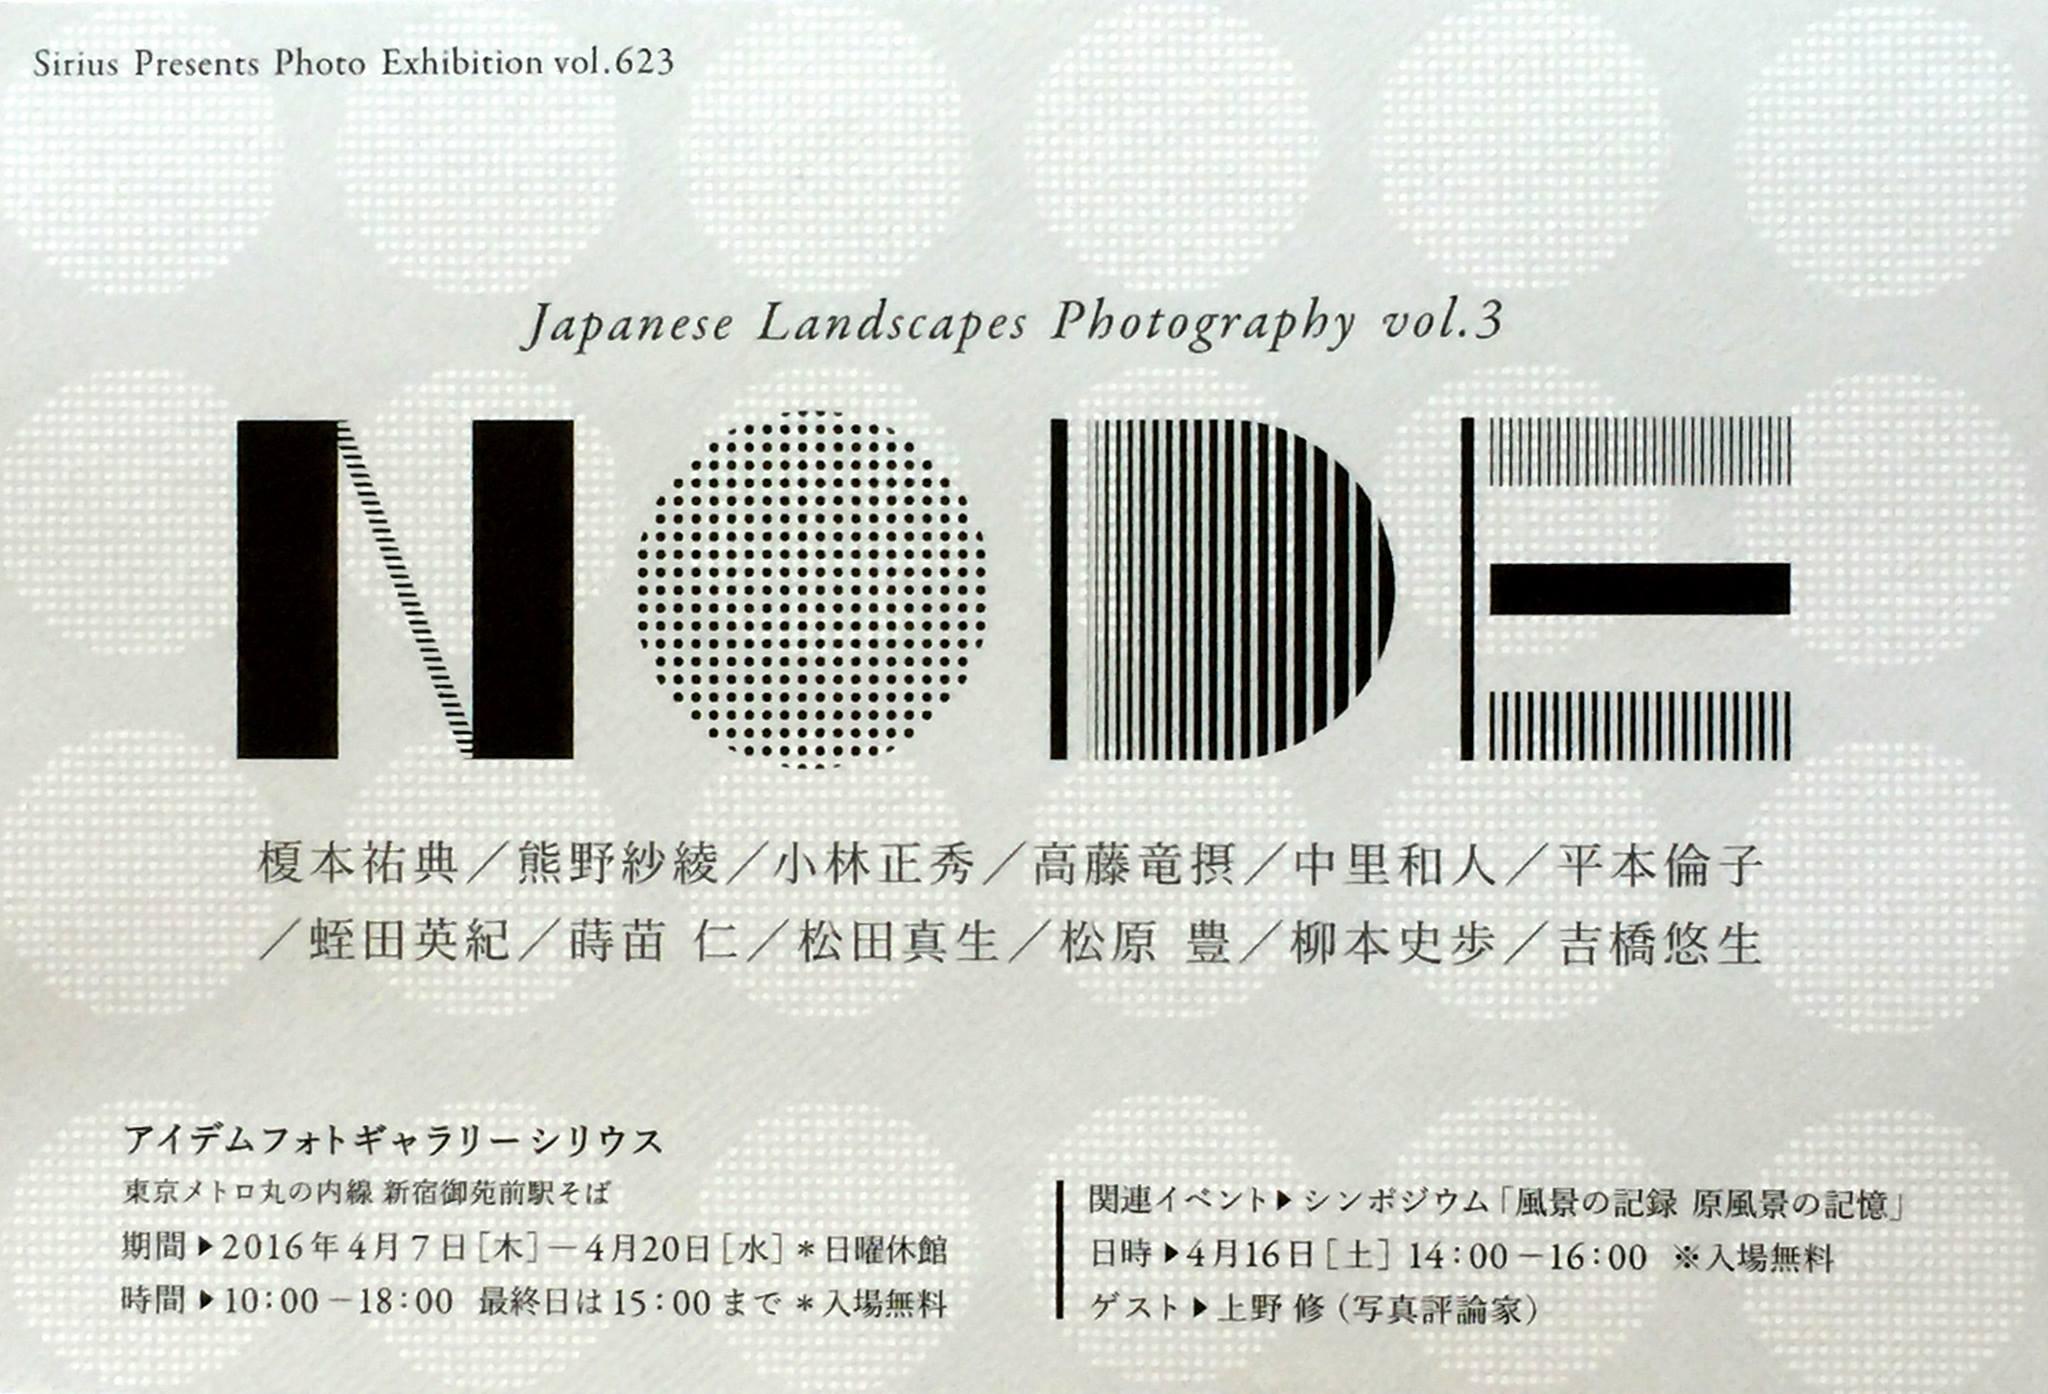 NODE Japanese Landscapes Photography vol.3